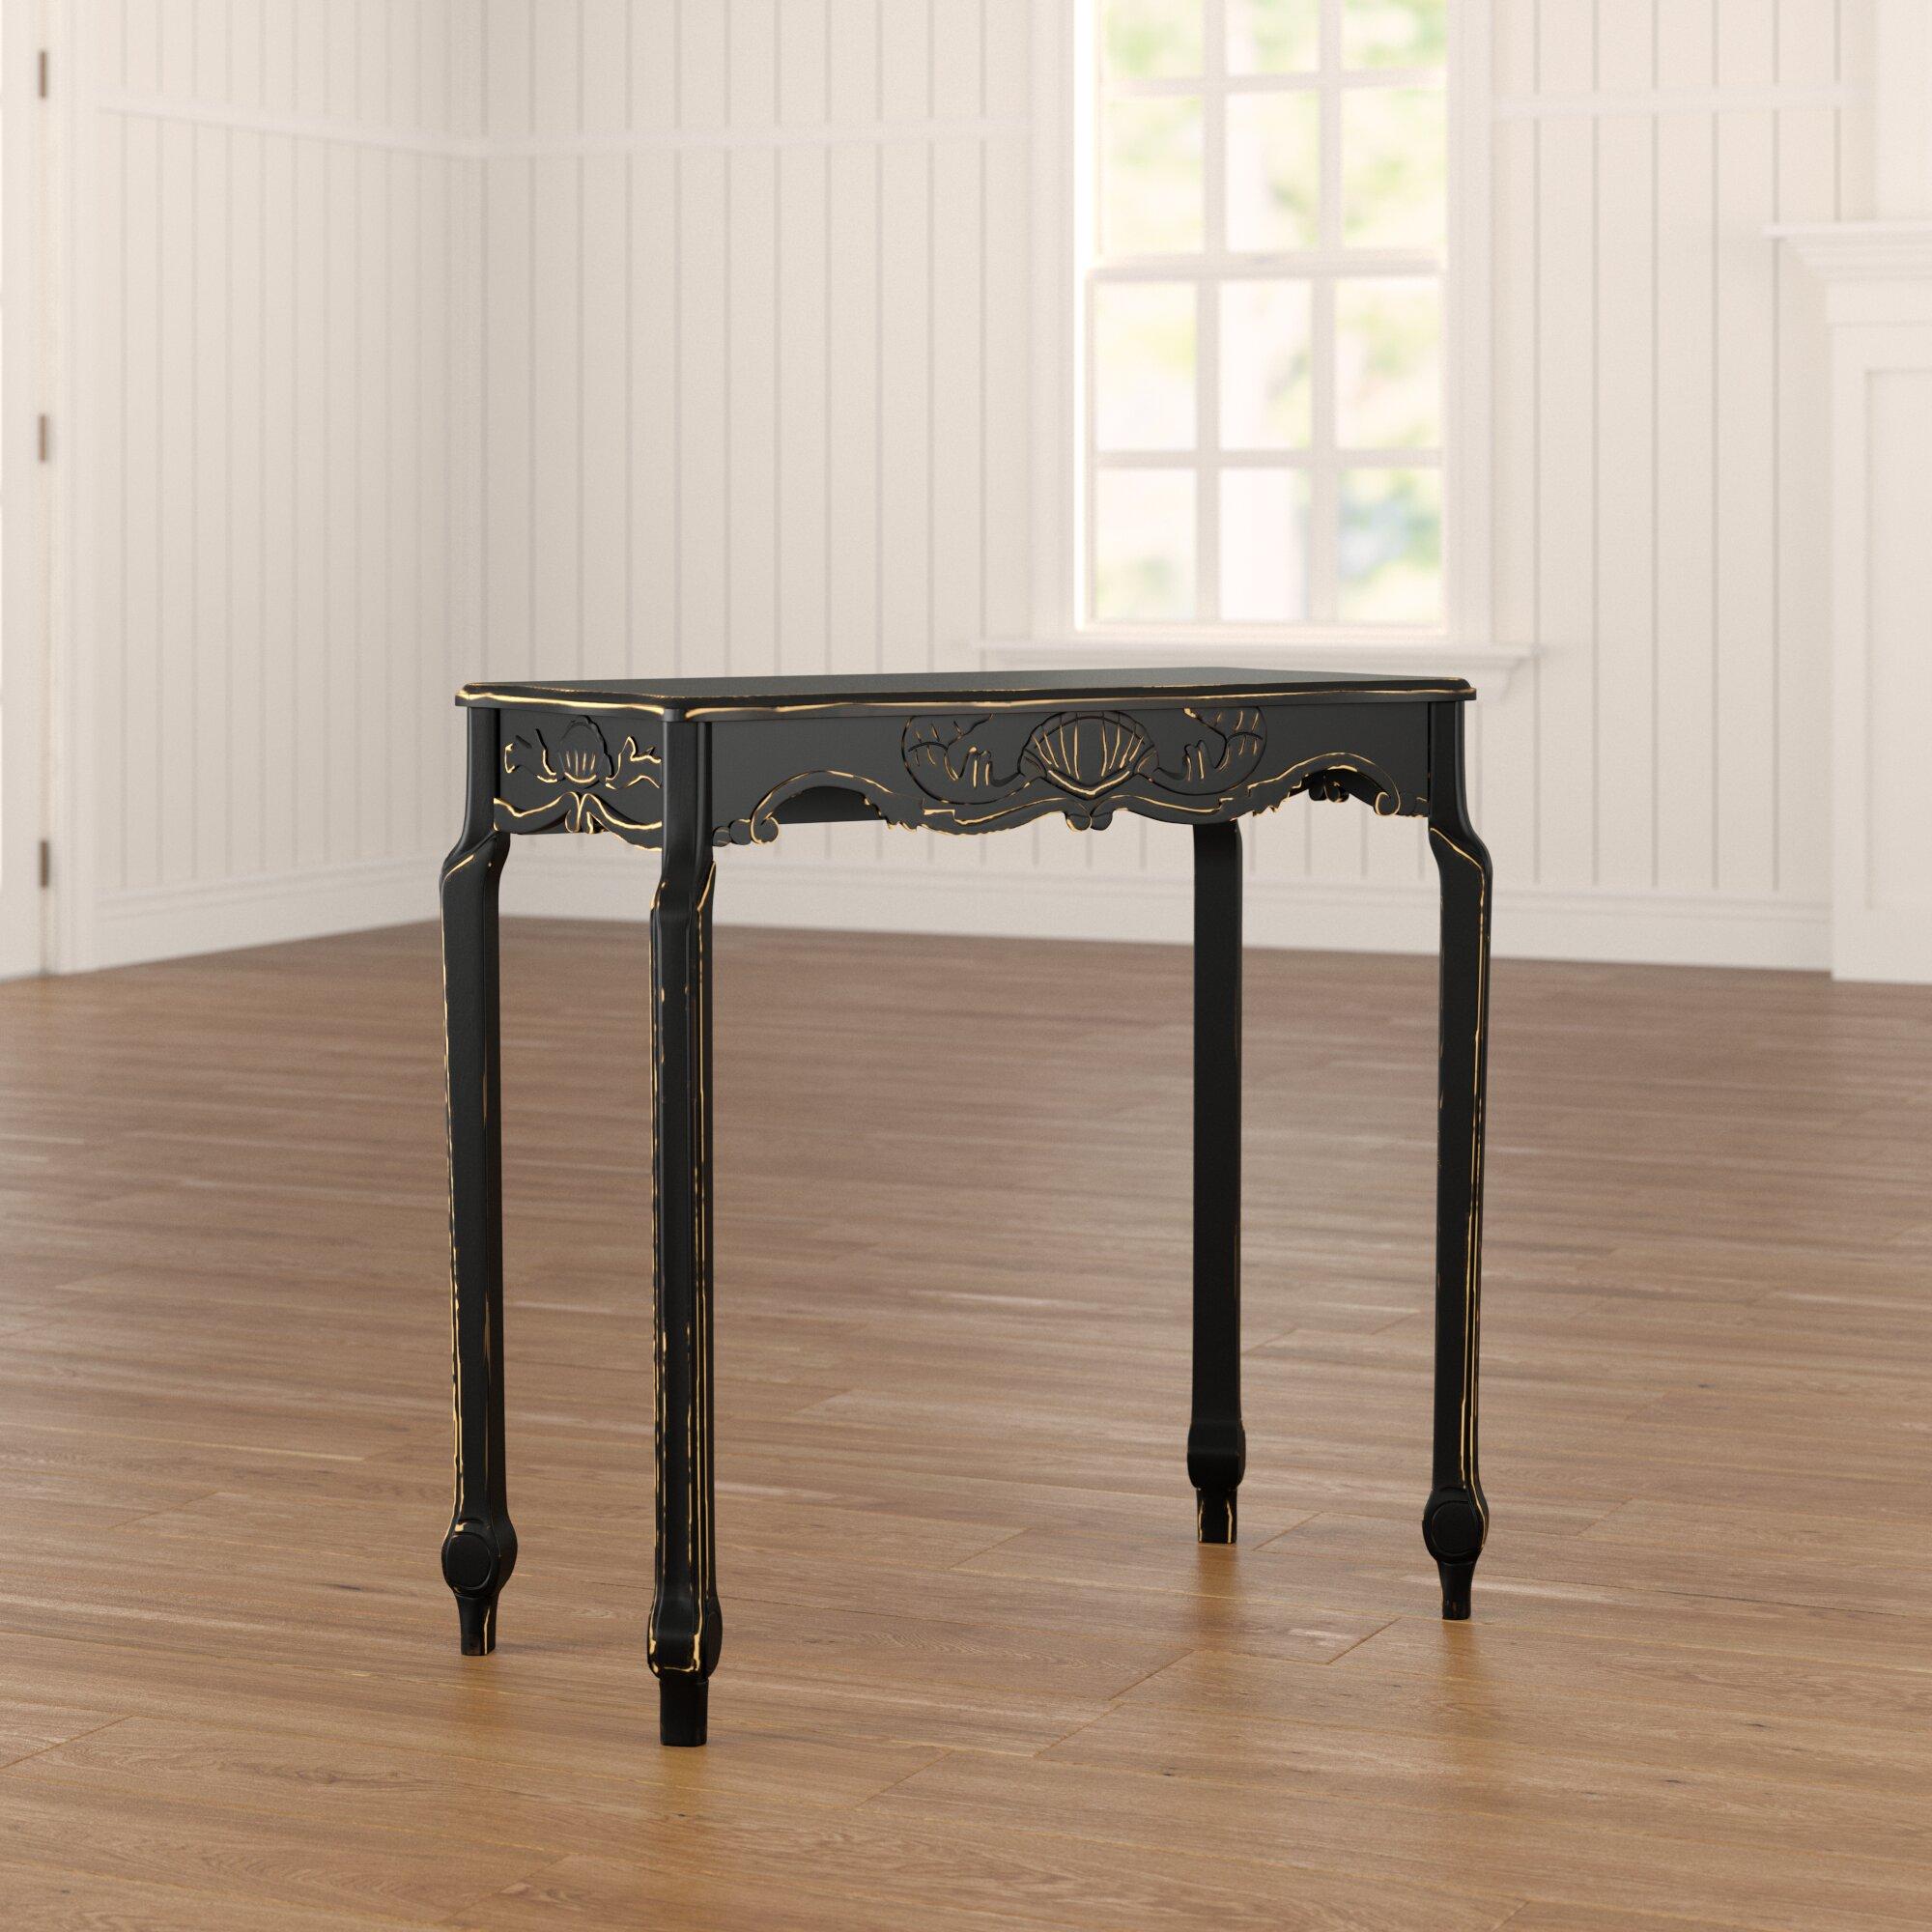 Astoria Grand Carling Foyer Console Table & Reviews | Wayfair